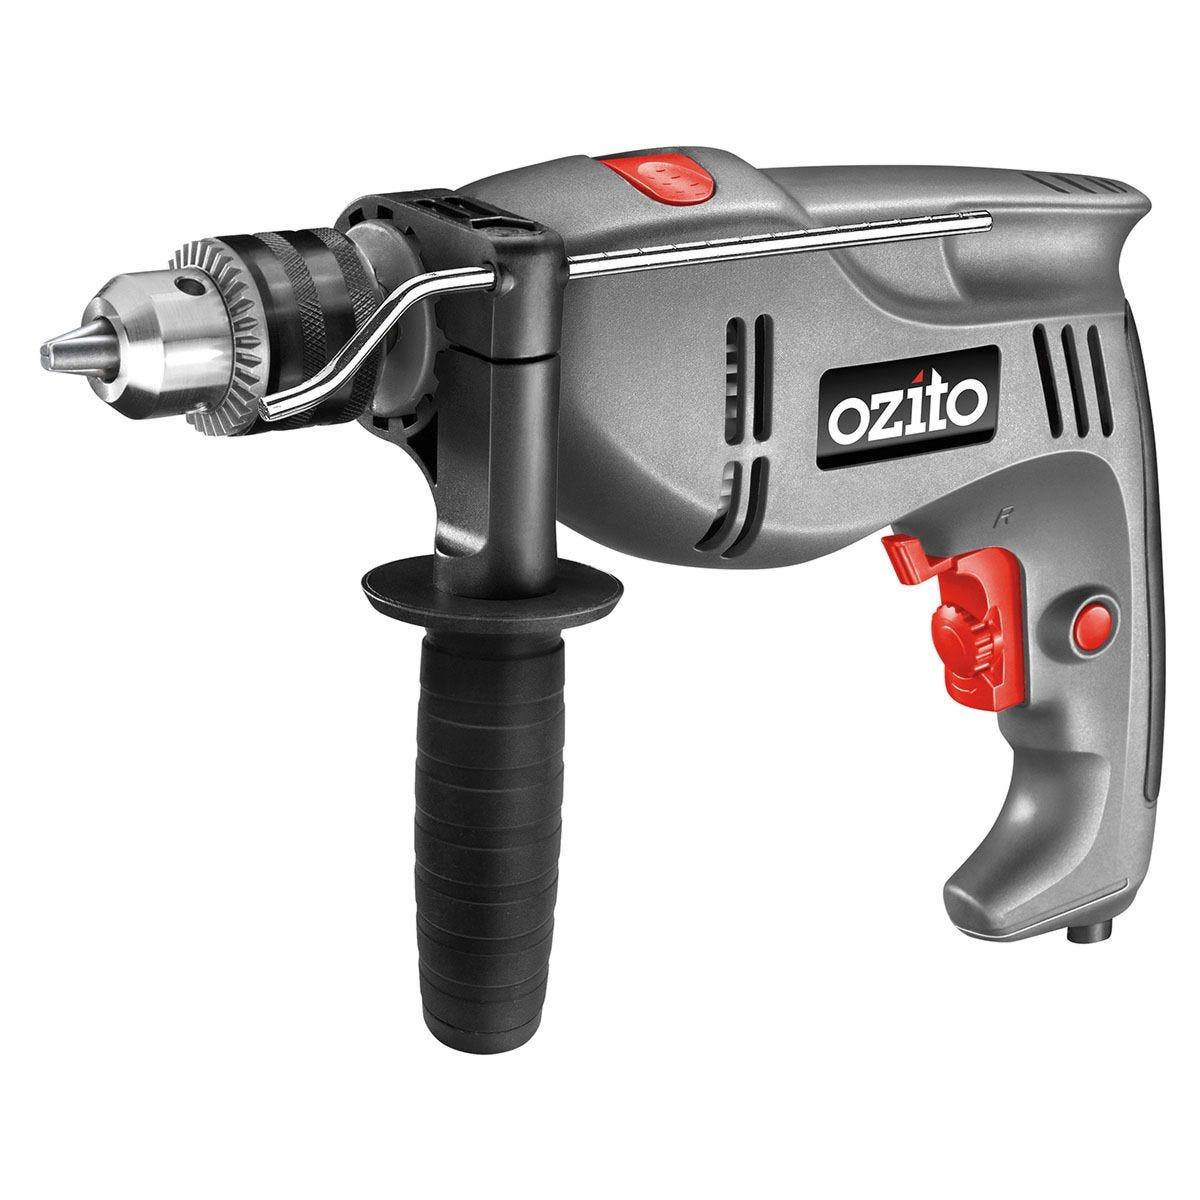 Ozito 710W Hammer Drill